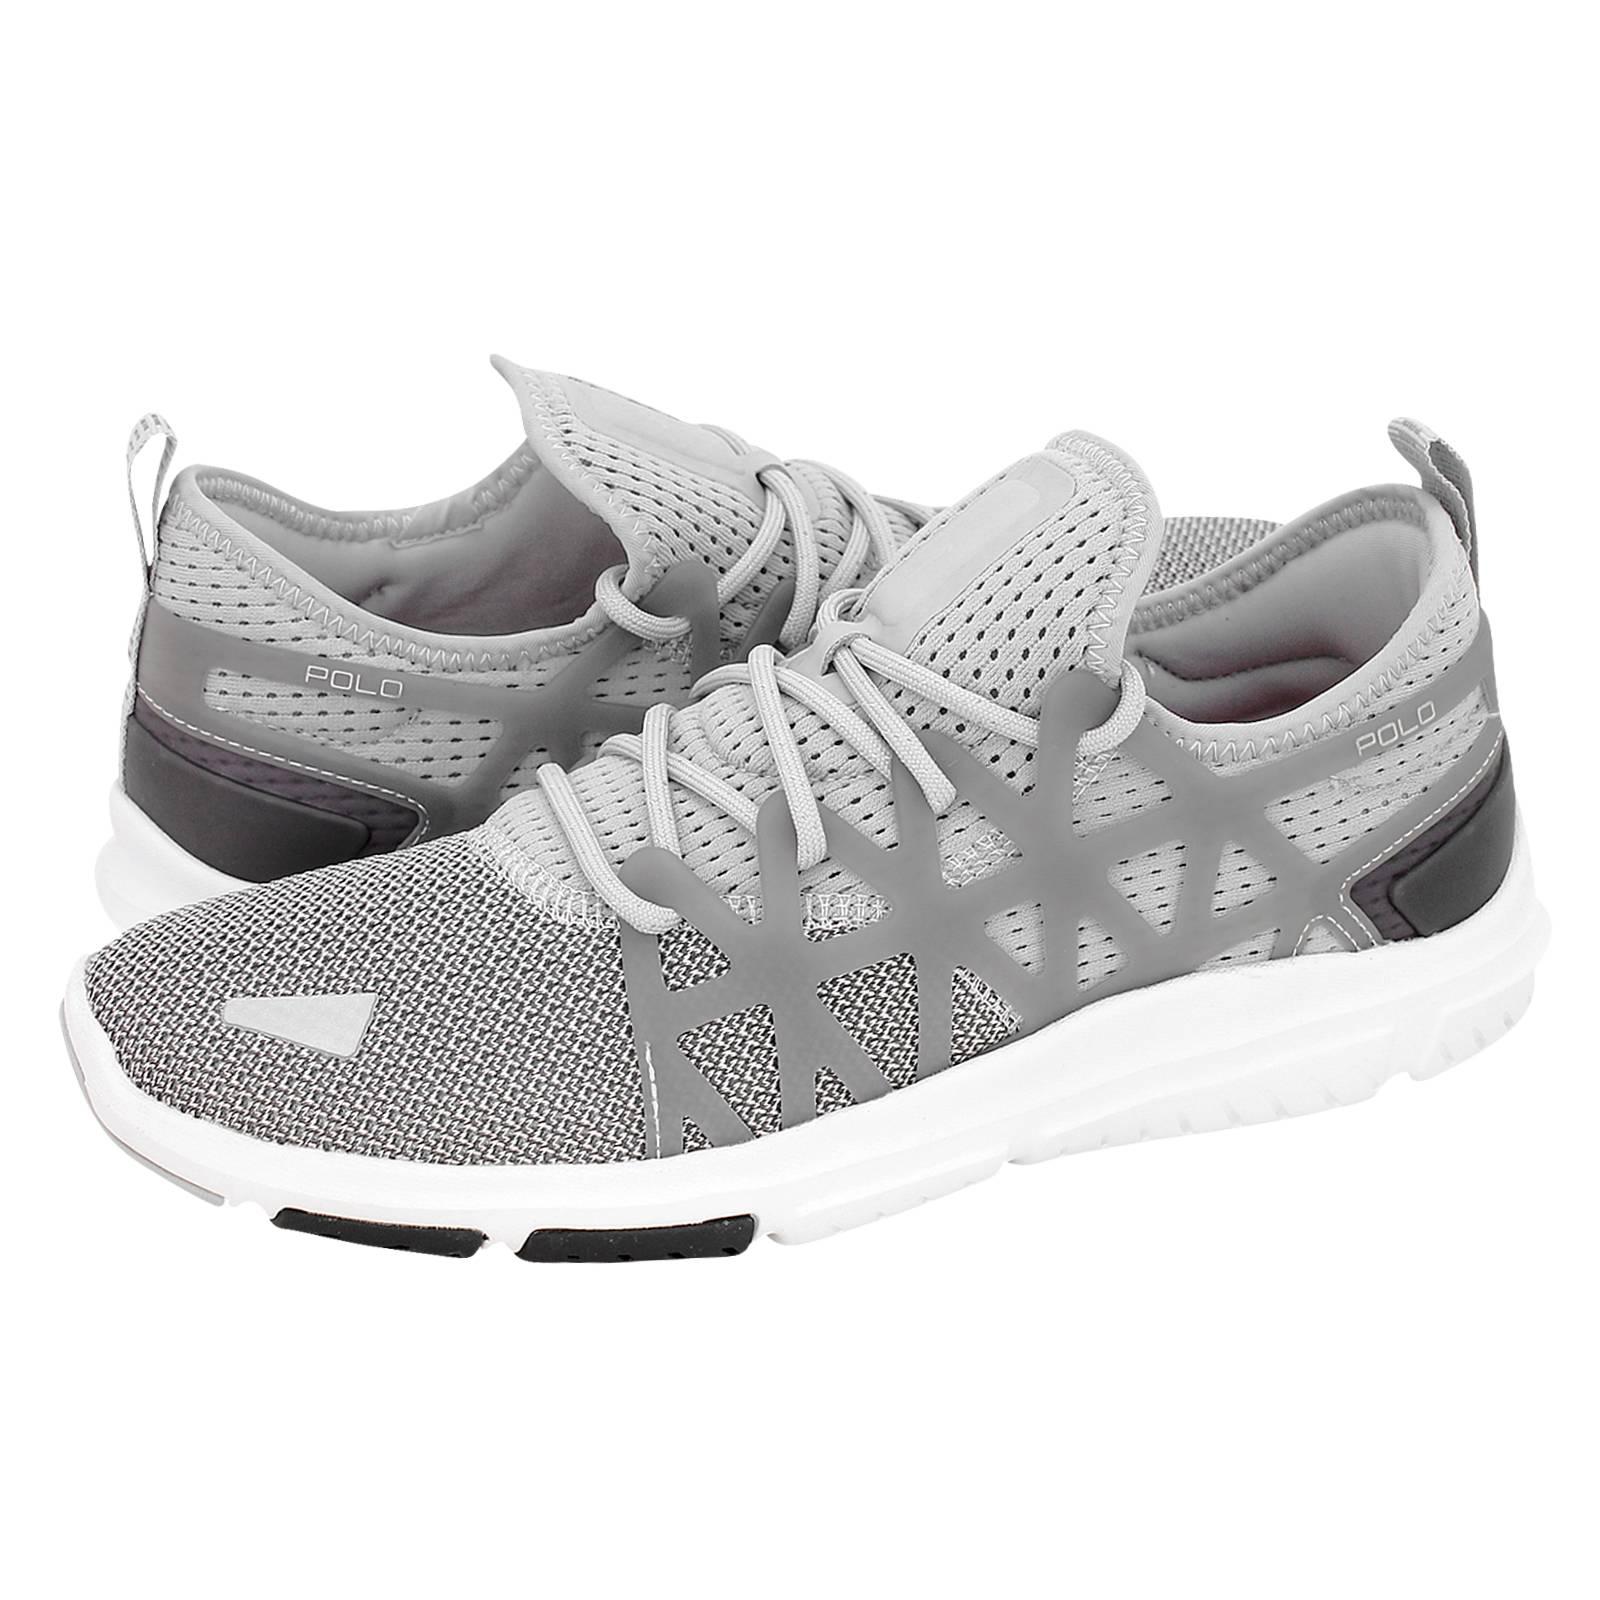 Train 200 Sneakers - Ανδρικά αθλητικά παπούτσια Polo Ralph Lauren ... 966577cc175